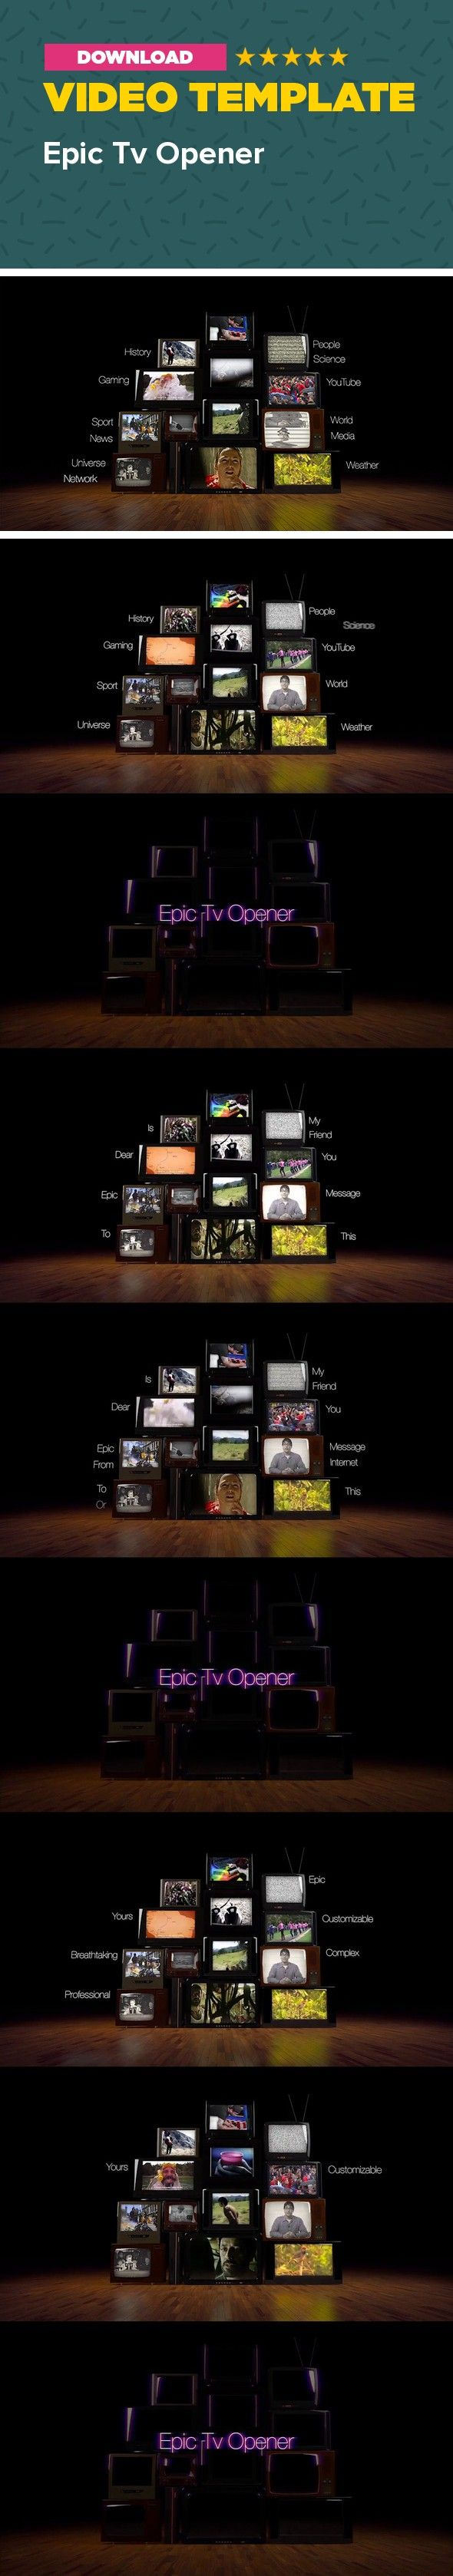 Best 25 3d television ideas on Pinterest